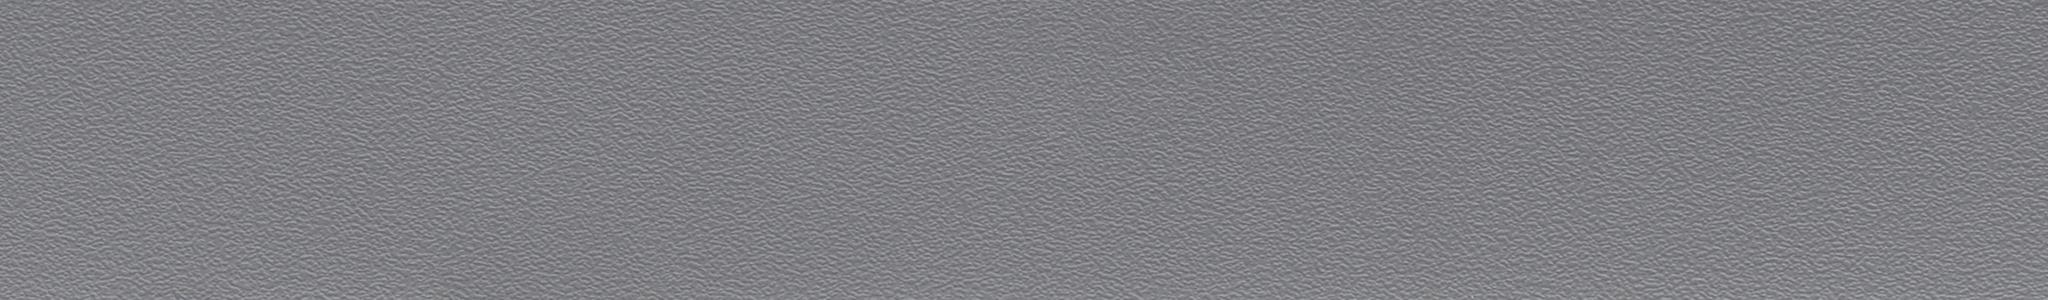 HU 172018 Кромка ABS Базальт Серый - Шагрень XG